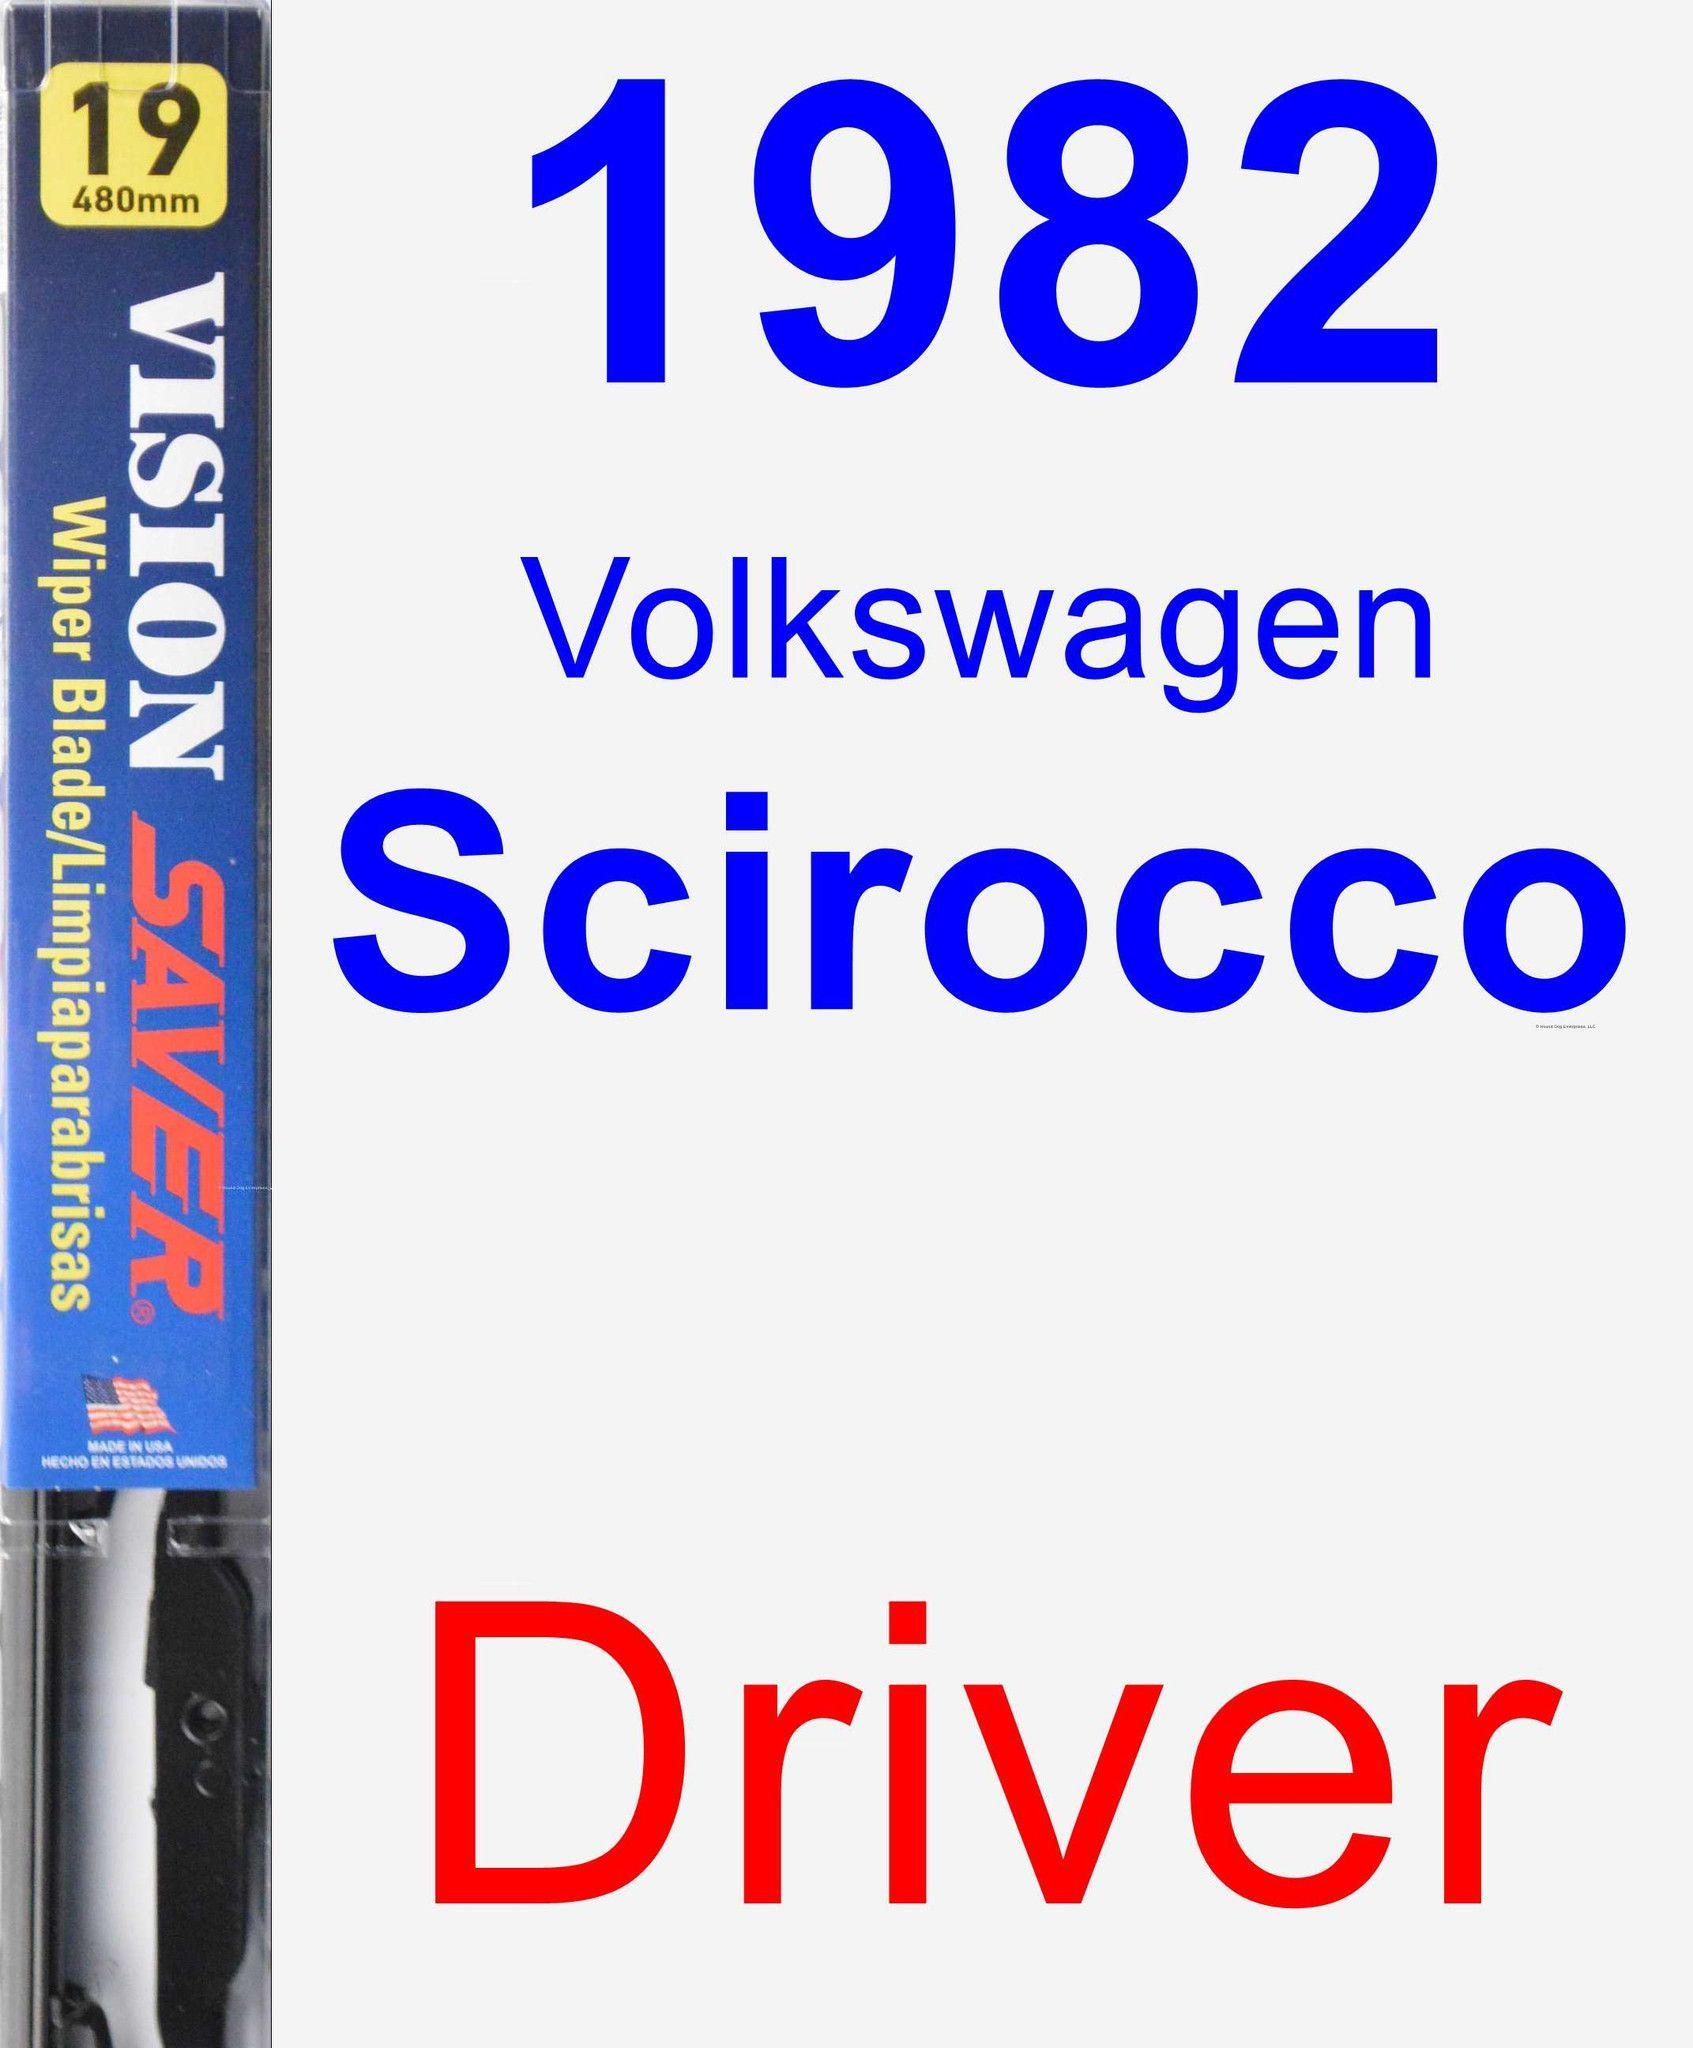 Driver Wiper Blade for 1982 Volkswagen Scirocco - Vision Saver